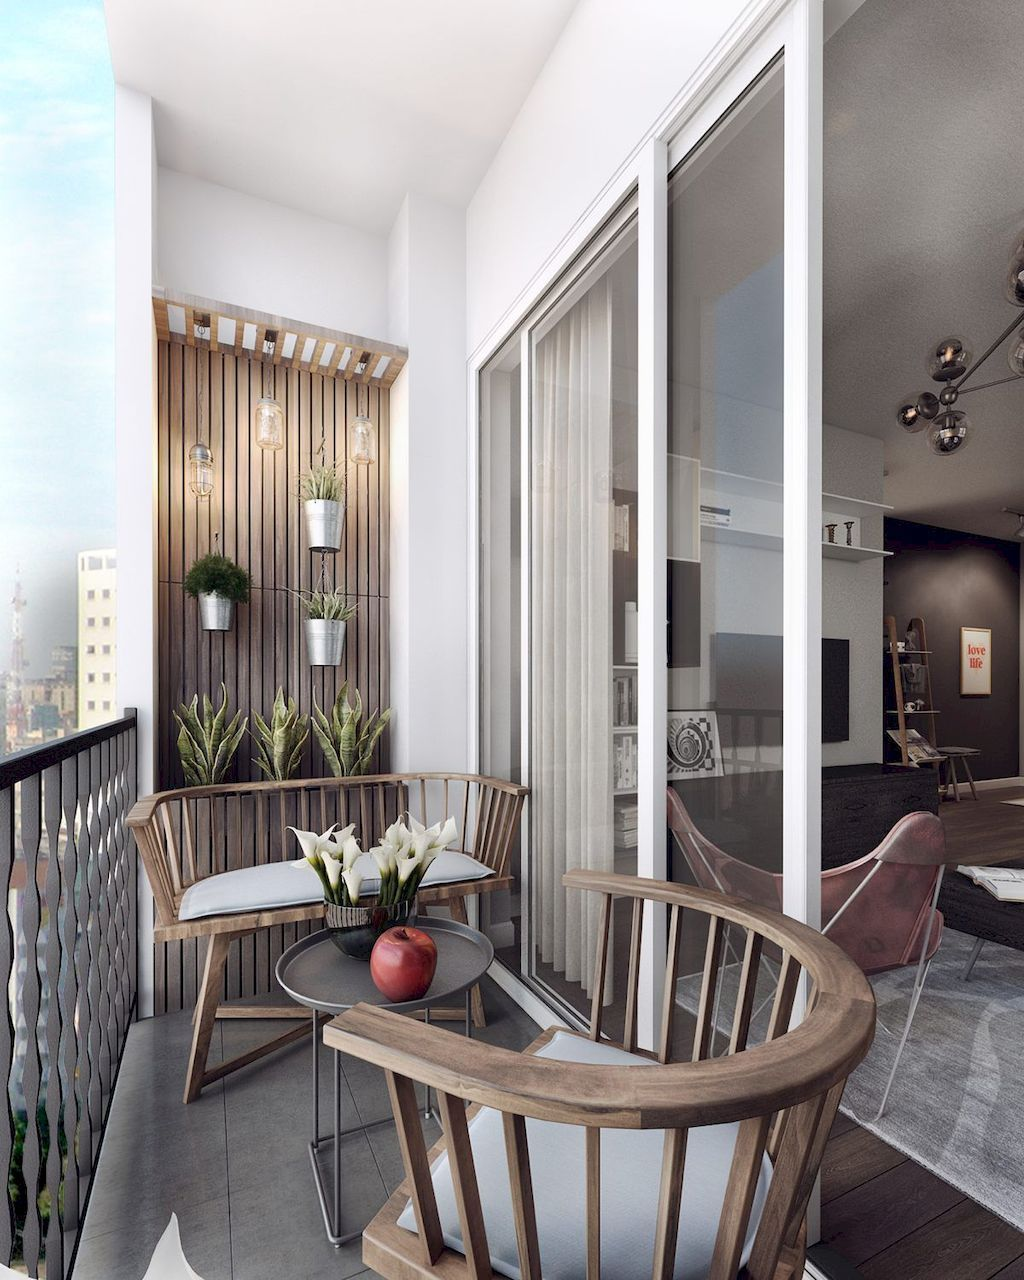 57 small apartment balcony decorating ideas home decor design in rh pinterest com